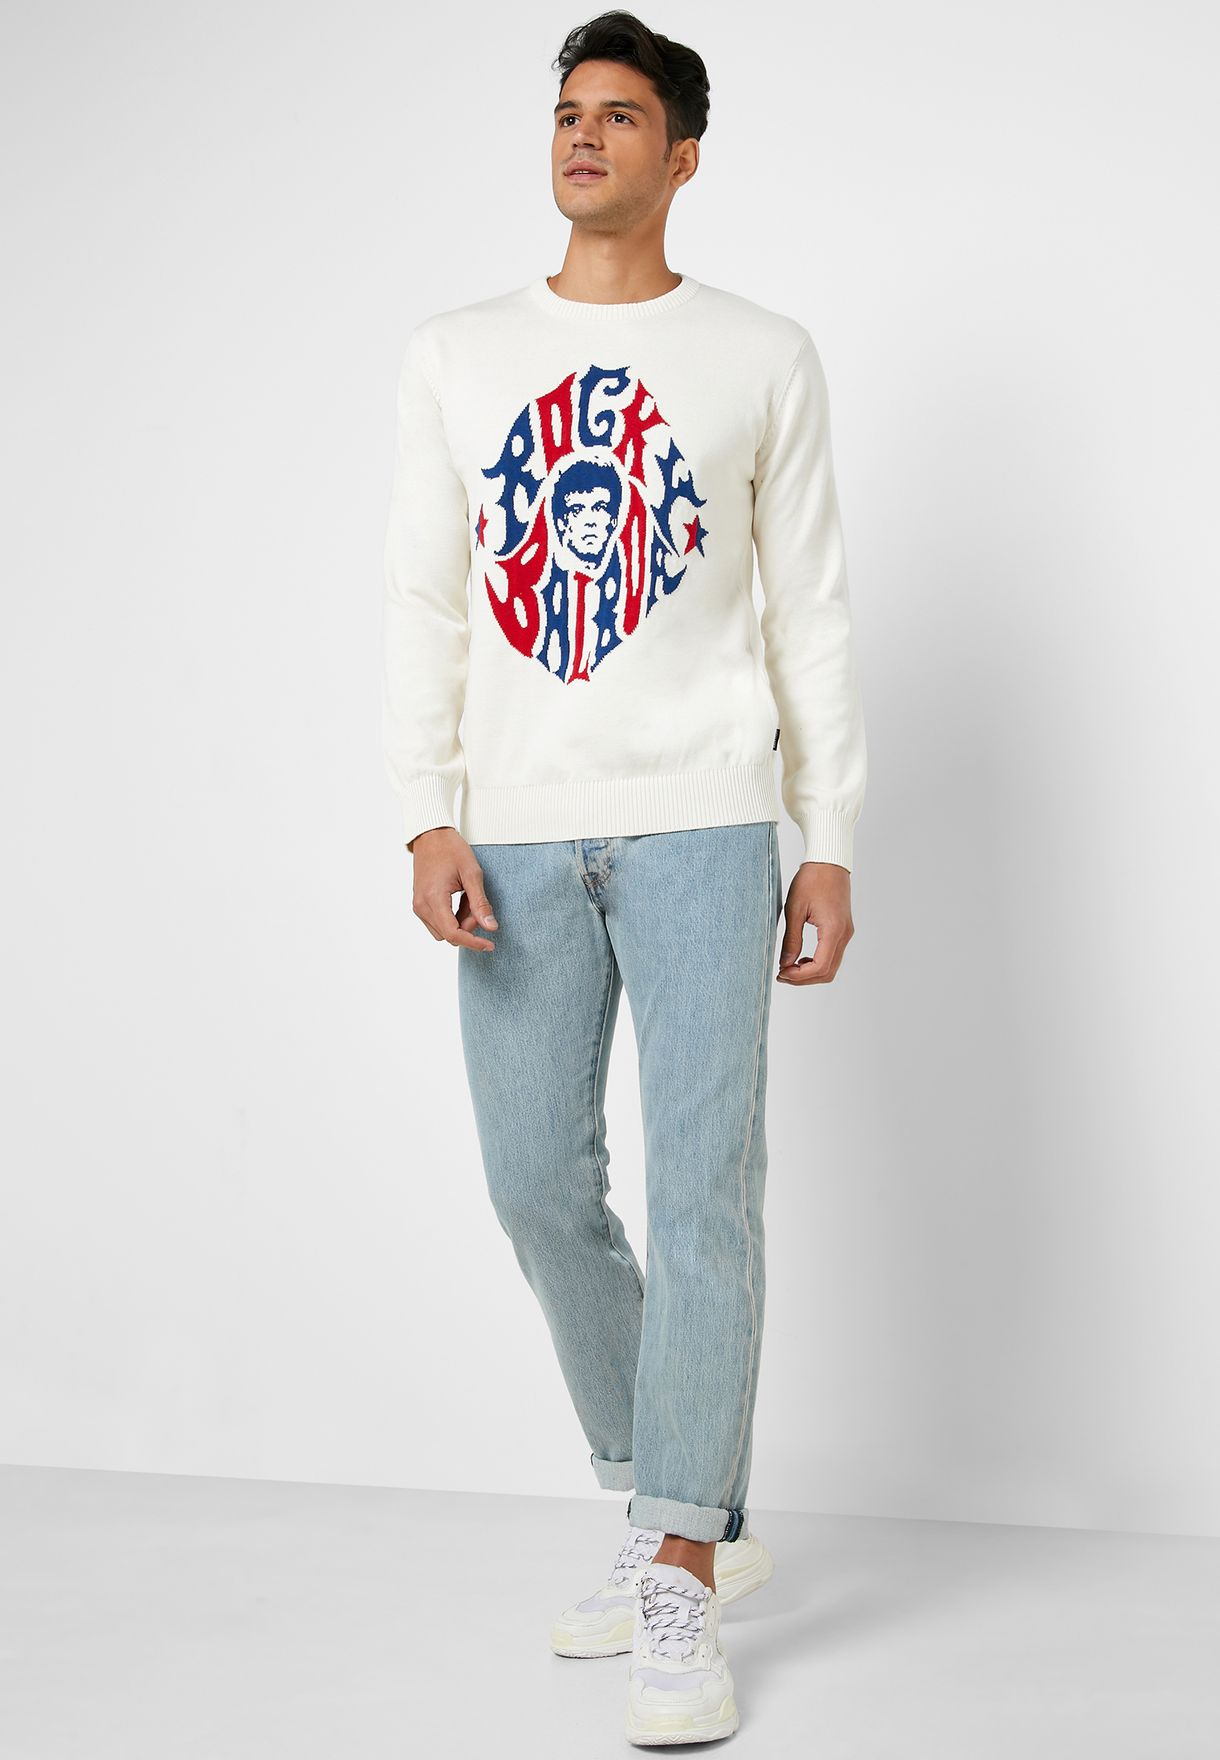 Rocky Balboa Sweater